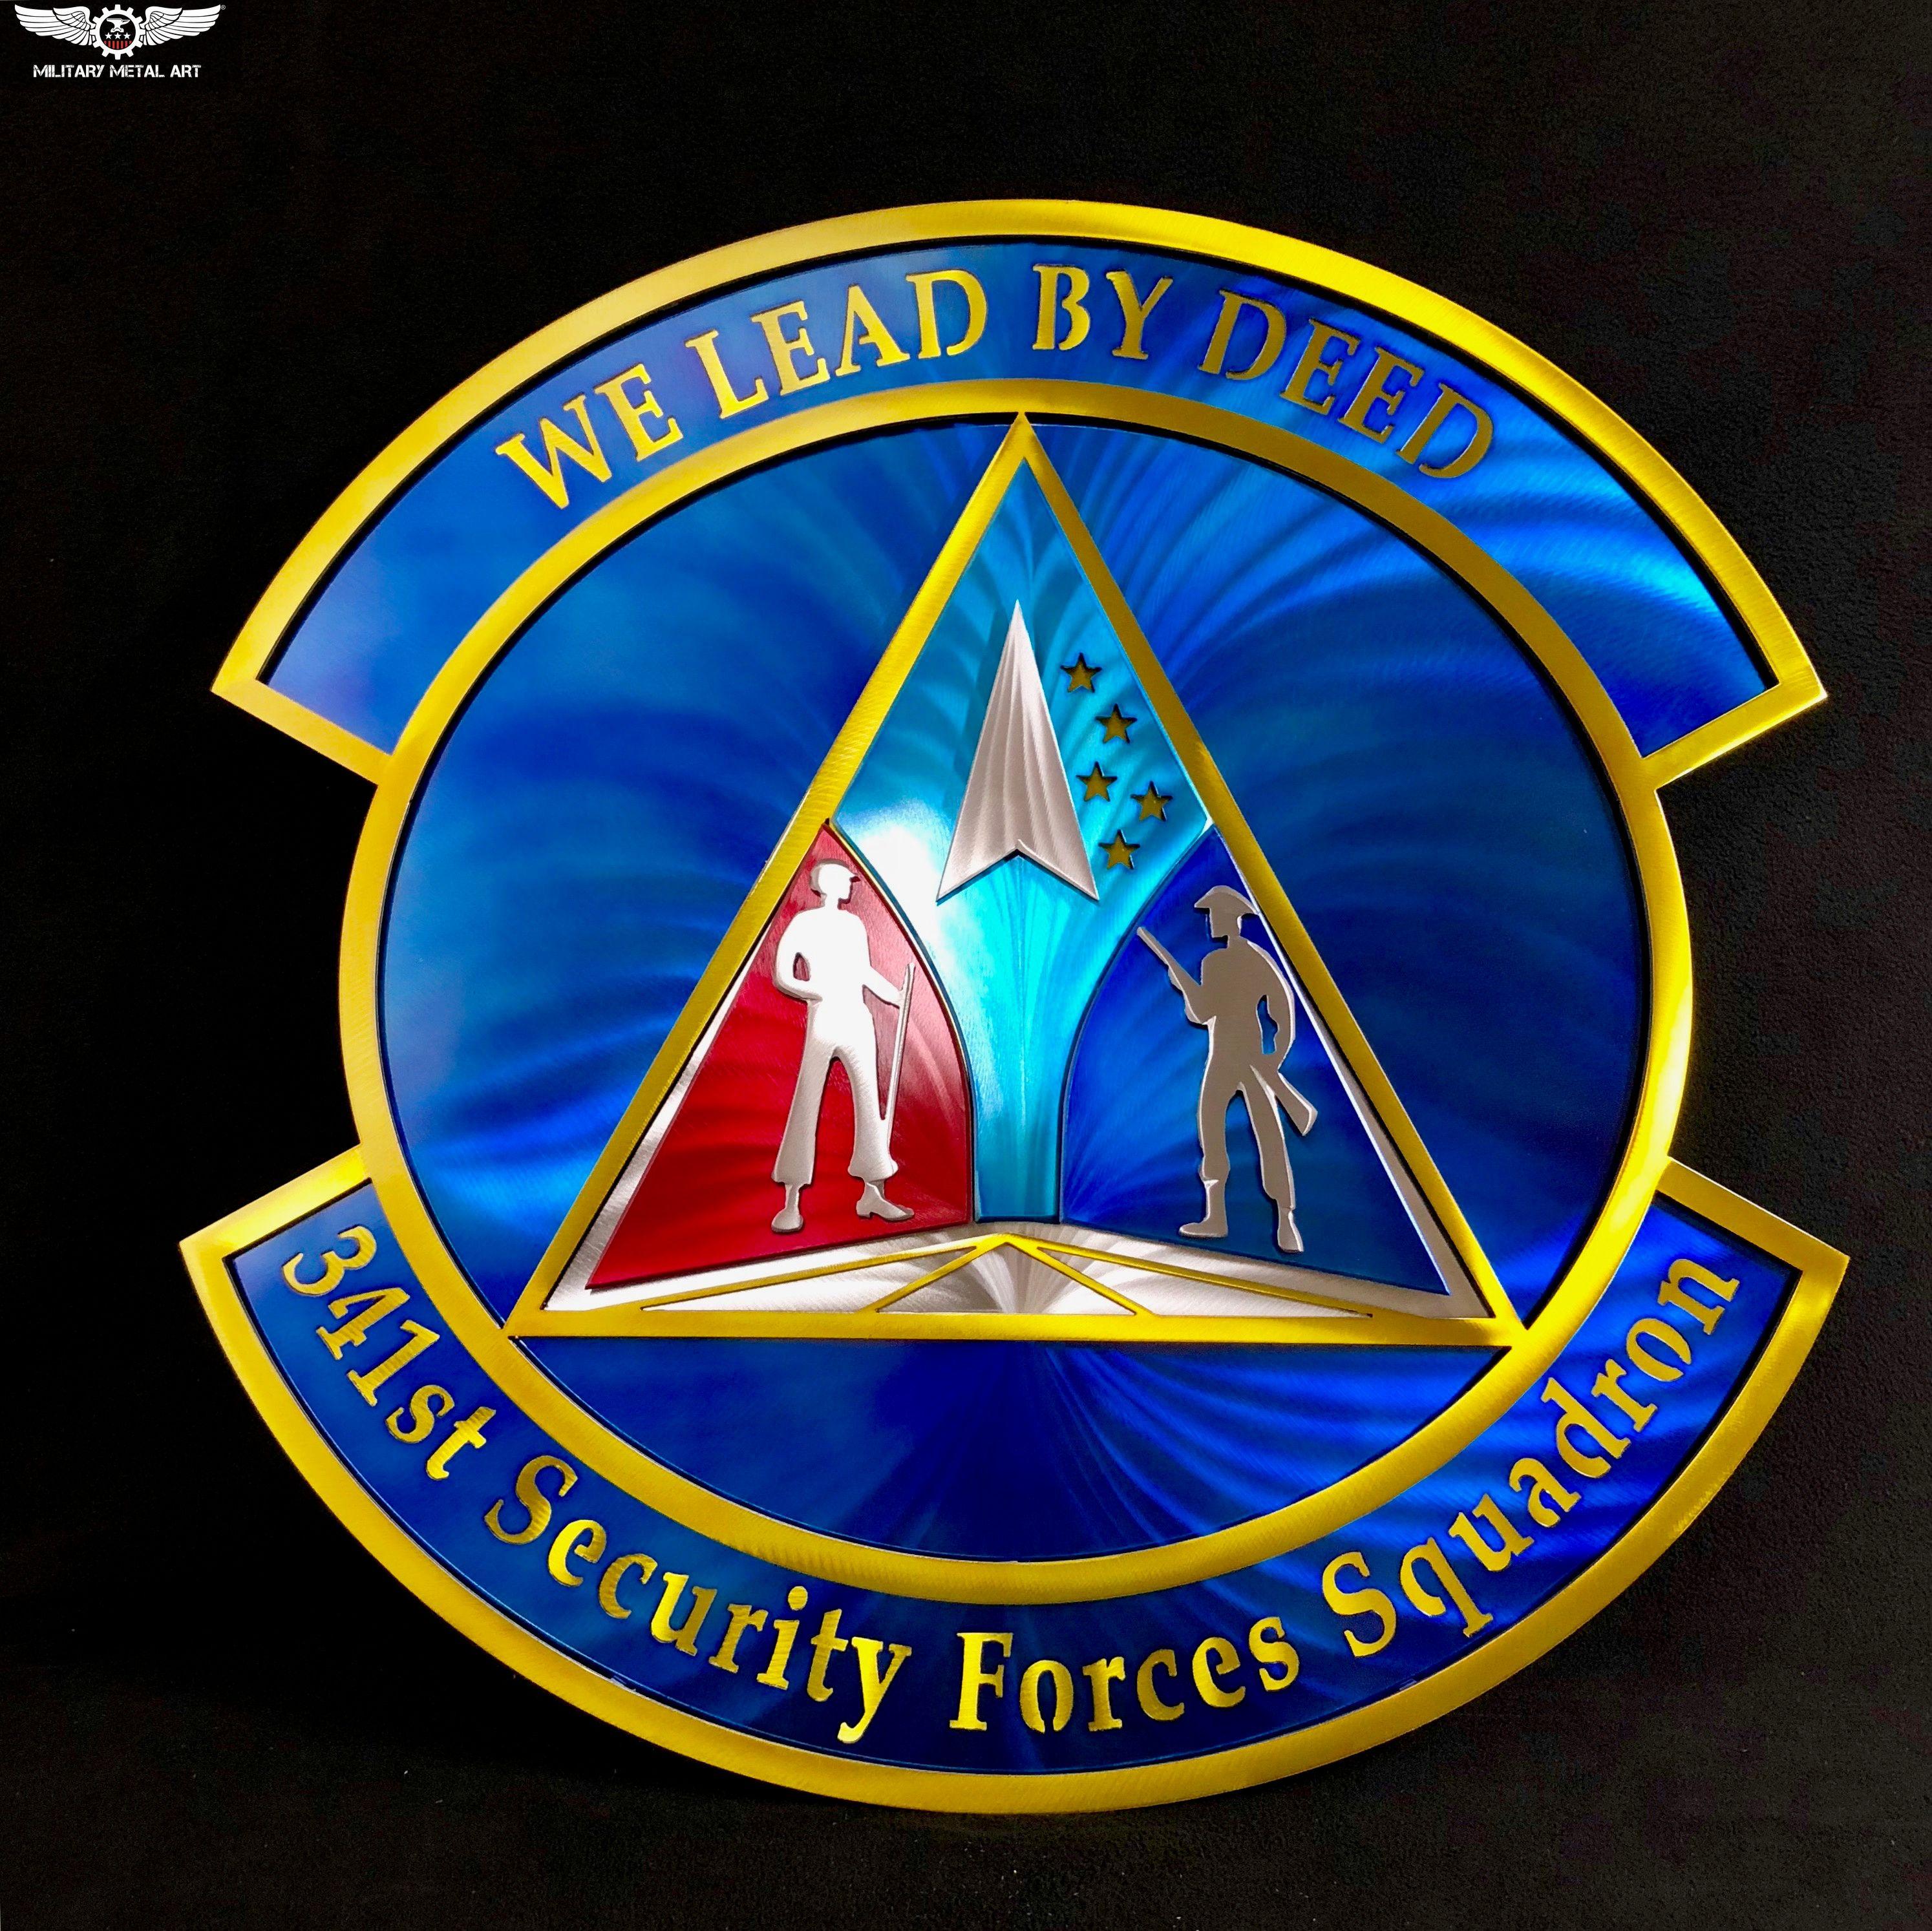 341st Security Forces Squadron Military Artwork Metal Art Art